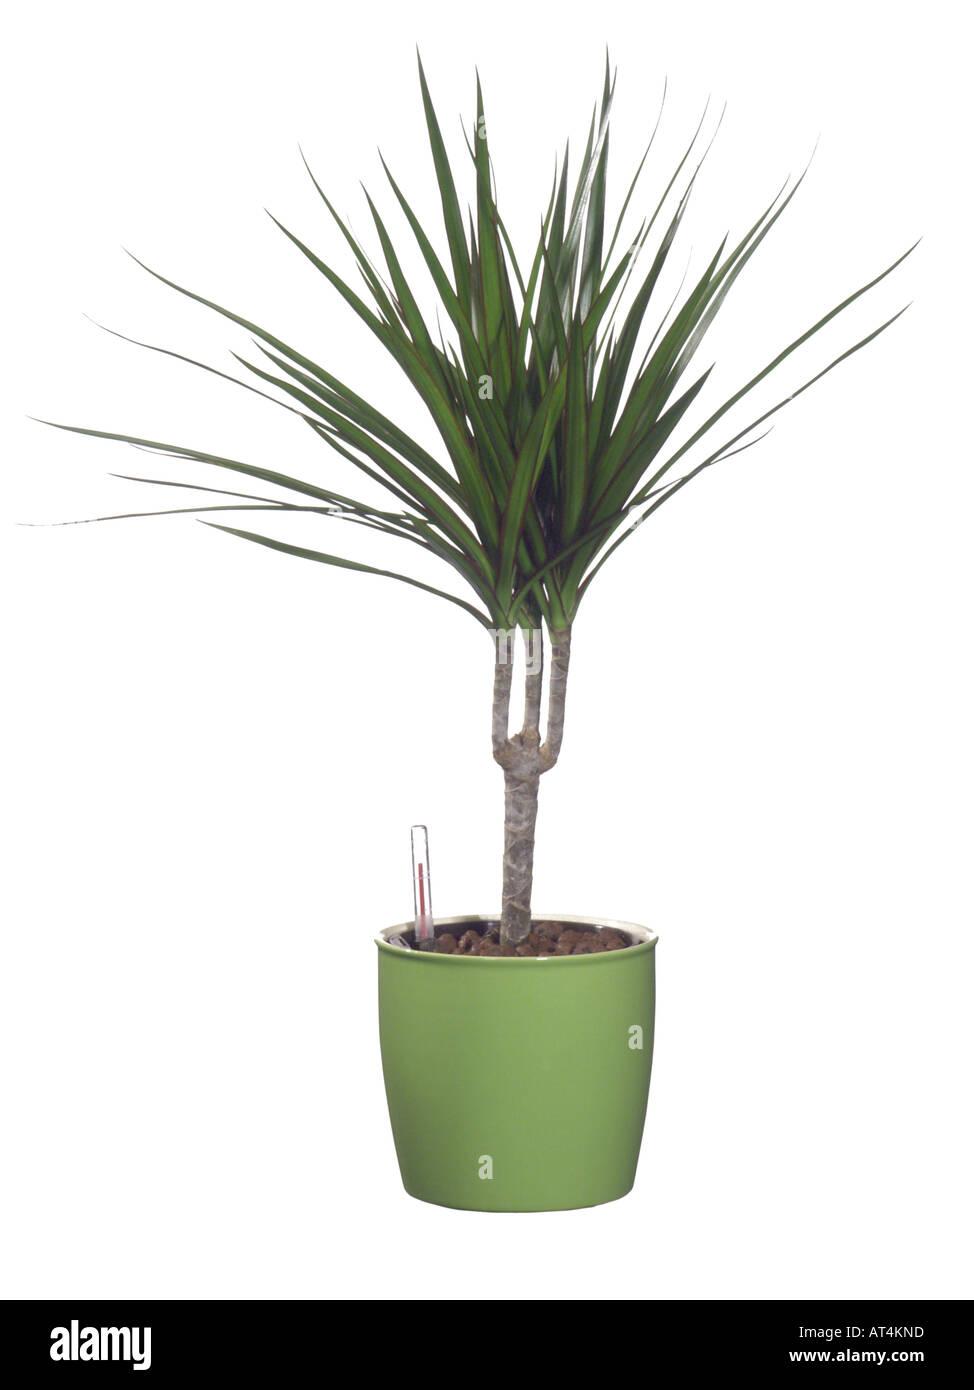 Atemberaubend Drachenbaum (Dracaena Marginata), Hydrokultur Pflanzen Stockfoto &WM_59